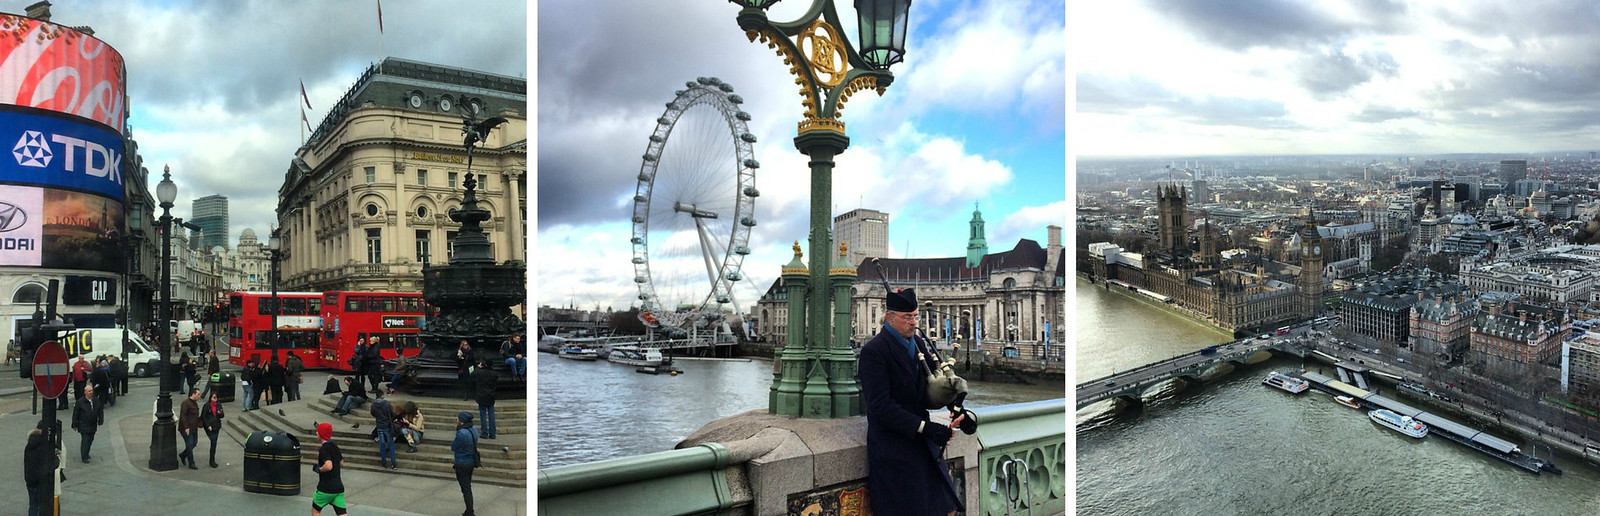 PicMonkey Collage Lontoo